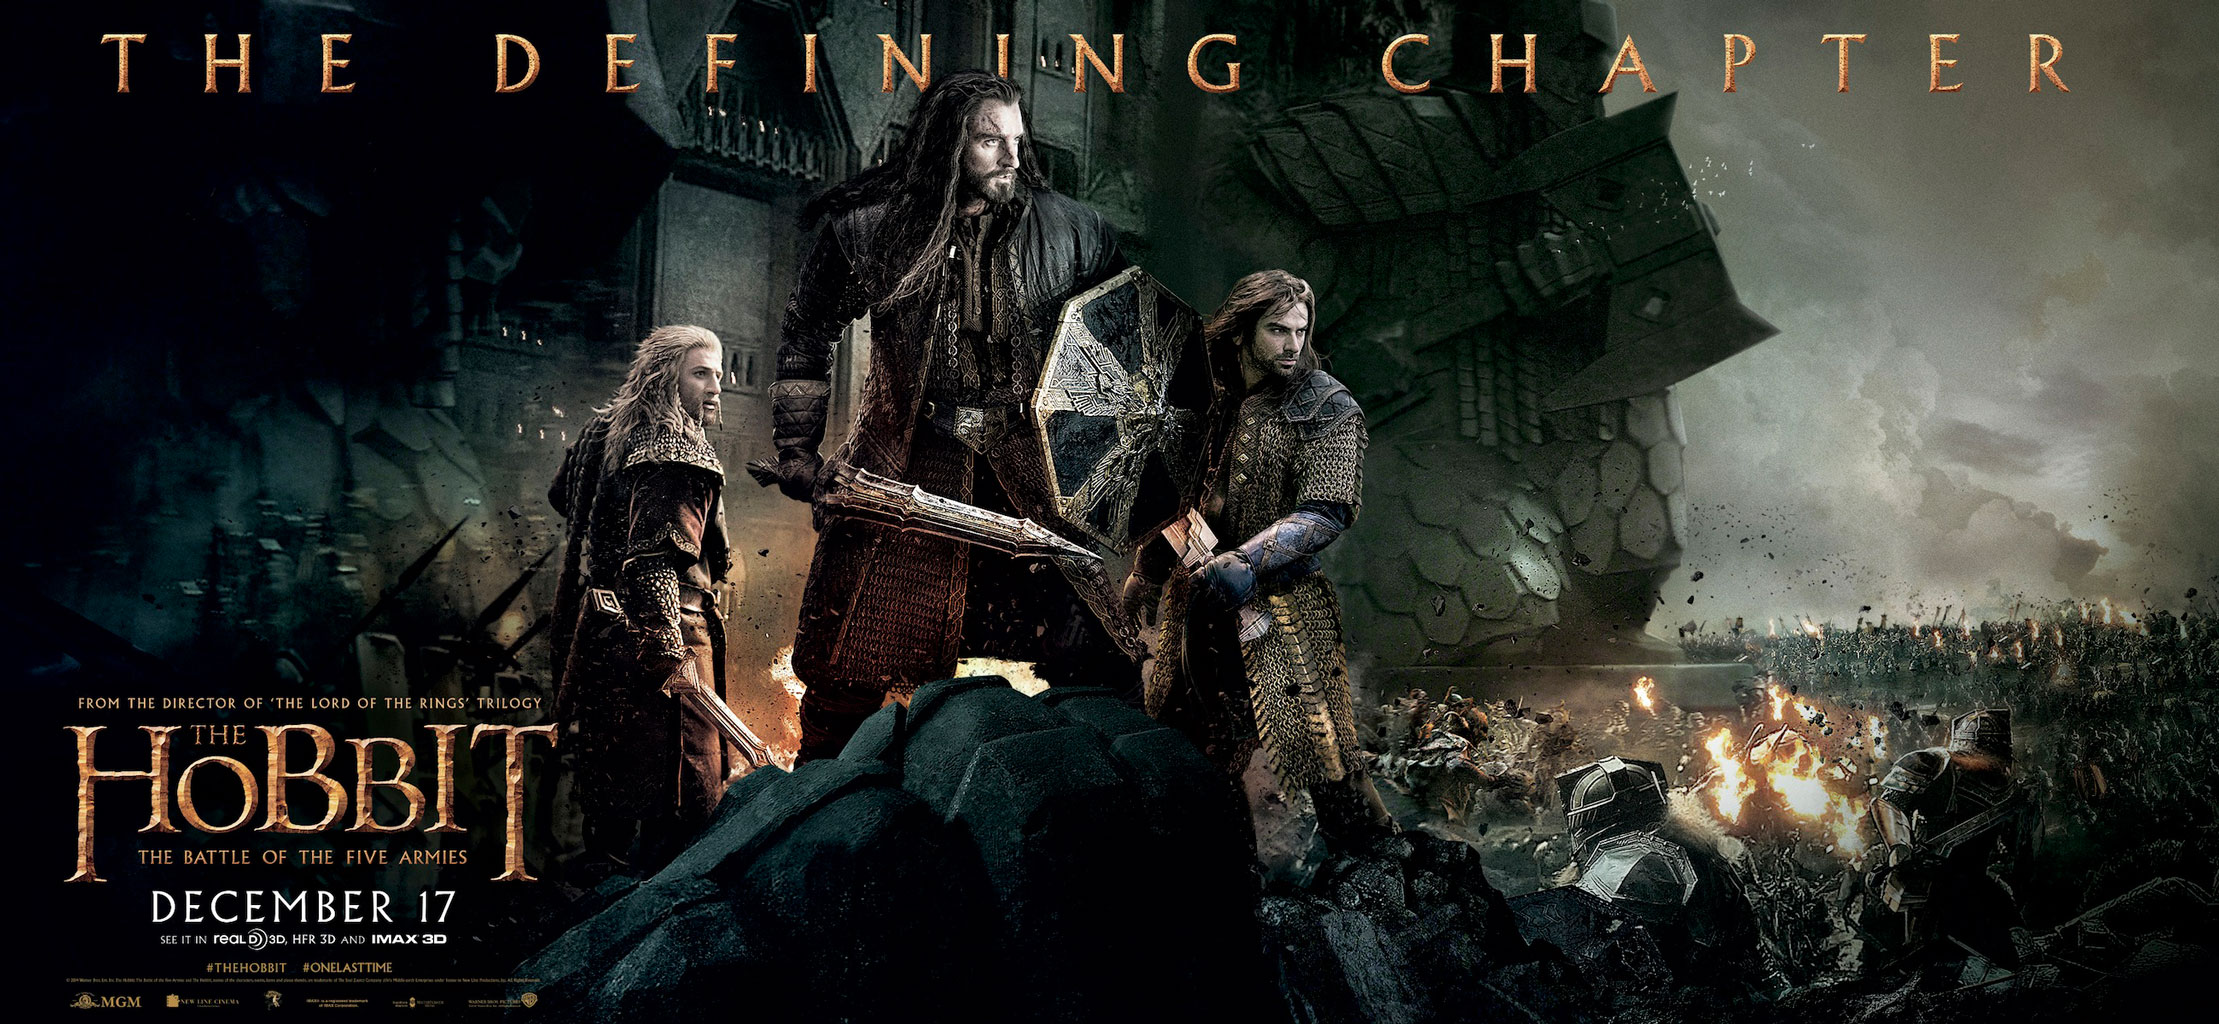 The Hobbit 3: The Battle of the Five Armies 2014 Movie & Smaug Desktop ... Necromancer Hobbit Desolation Of Smaug